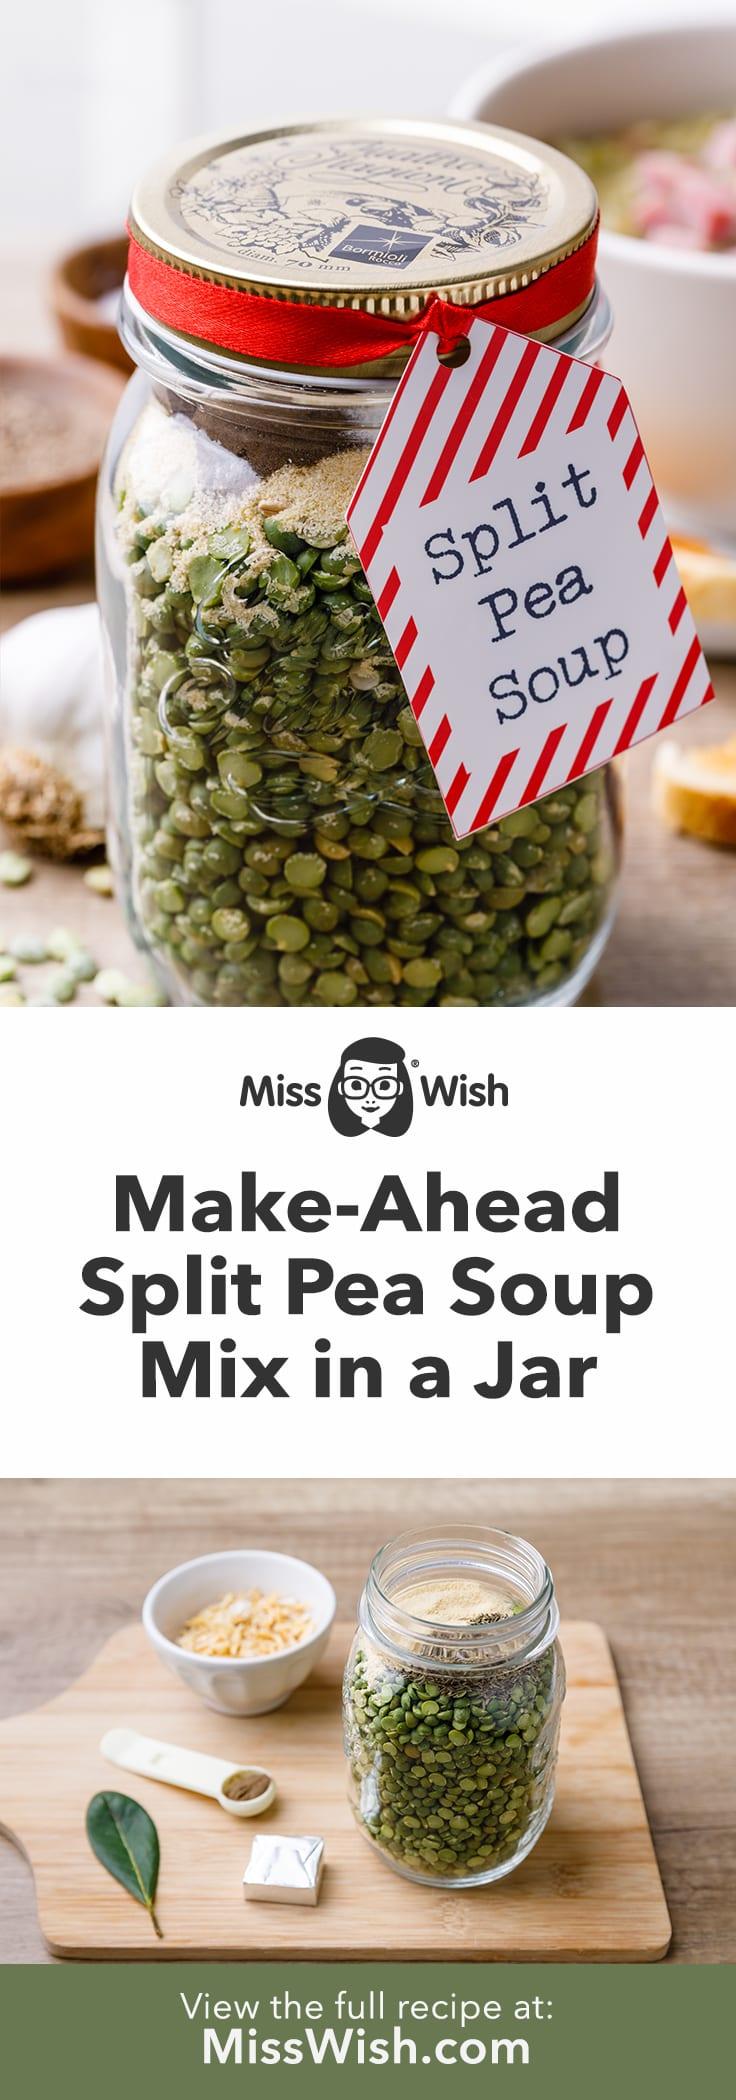 Make-Ahead Split Pea Soup Mix in a Jar